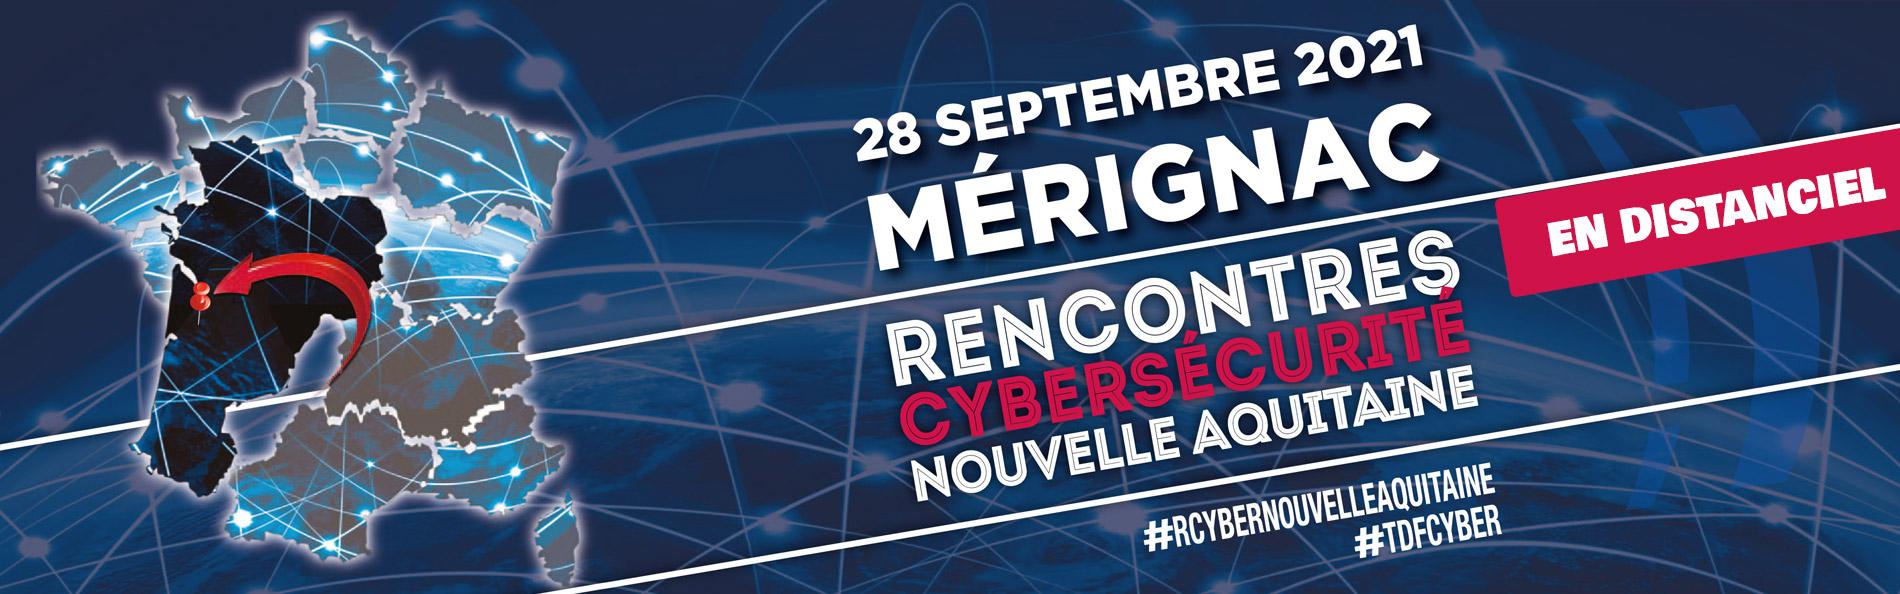 RCyber Nouvelle Aquitaine 2021